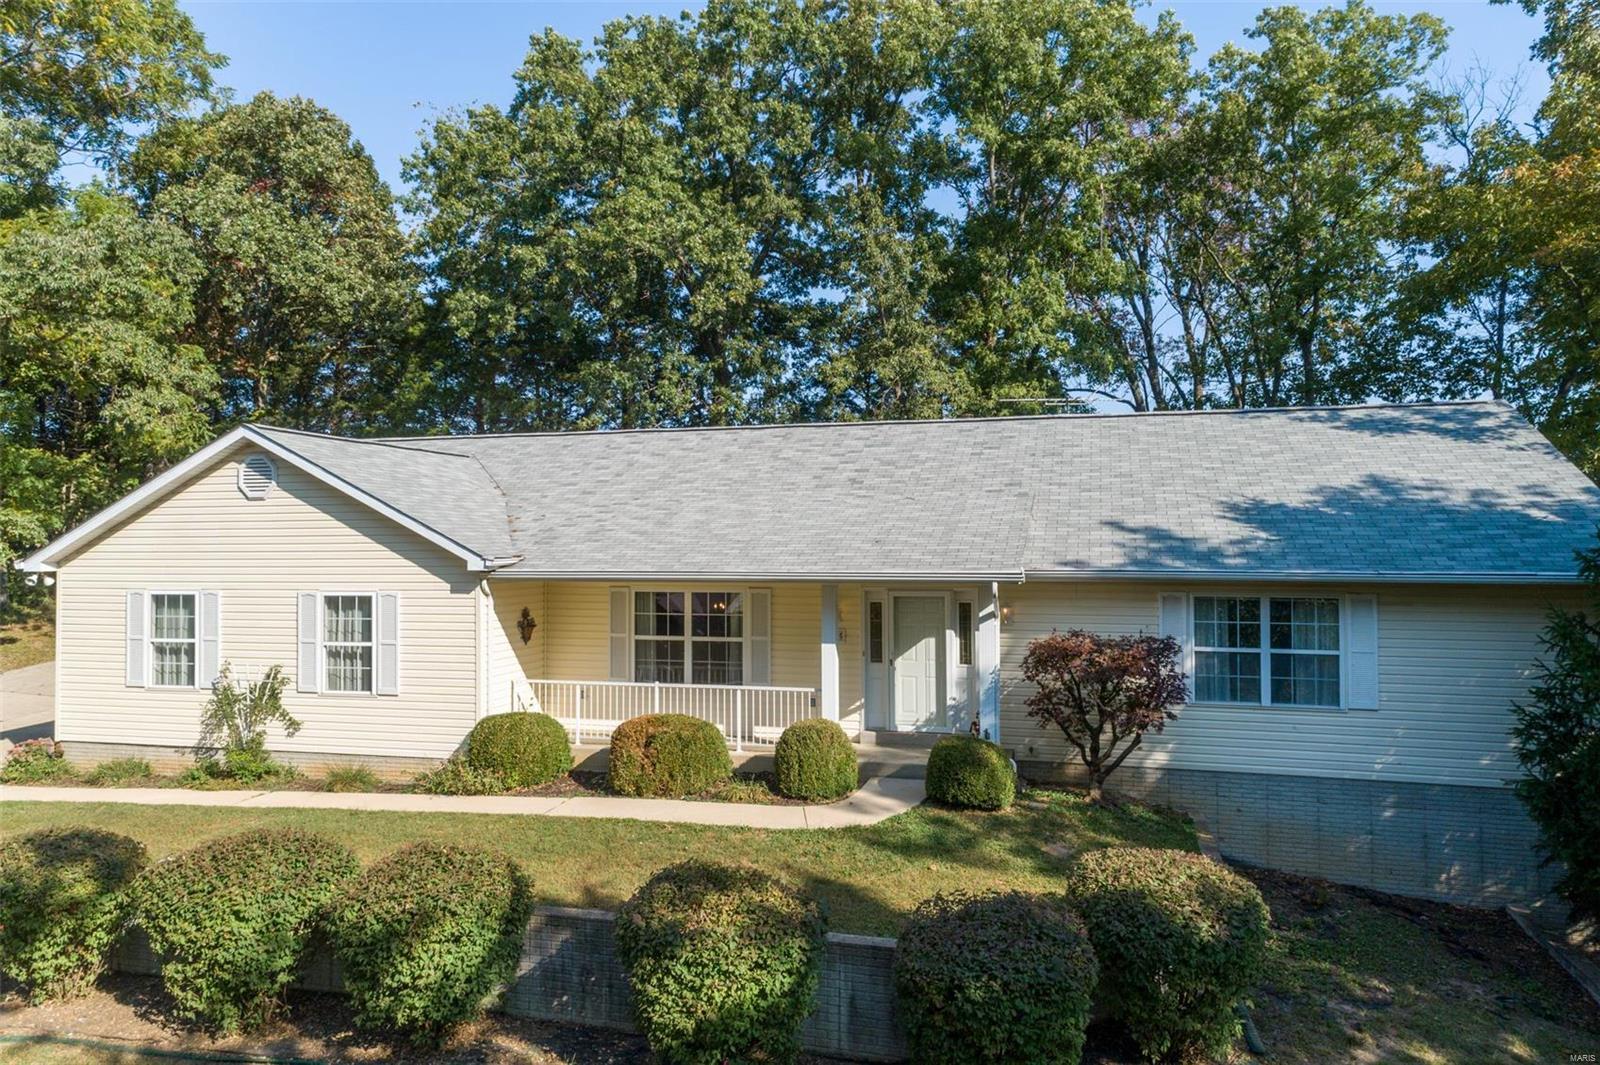 9535 Bent Tree Property Photo - Hillsboro, MO real estate listing